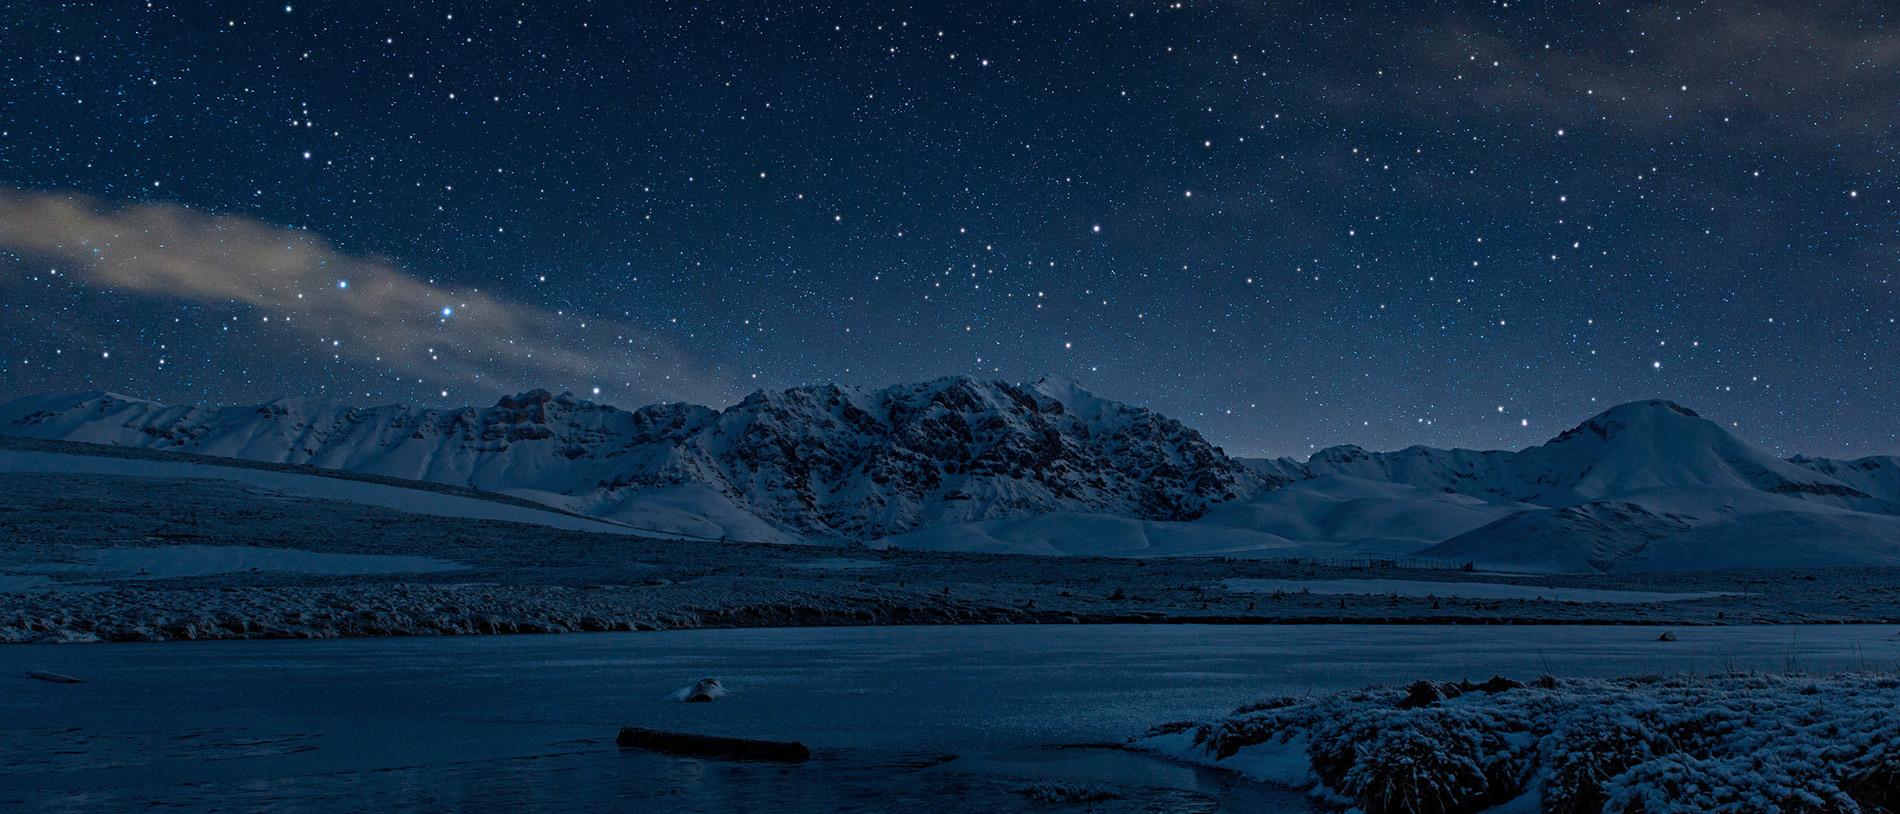 Fotografare paesaggi notturni